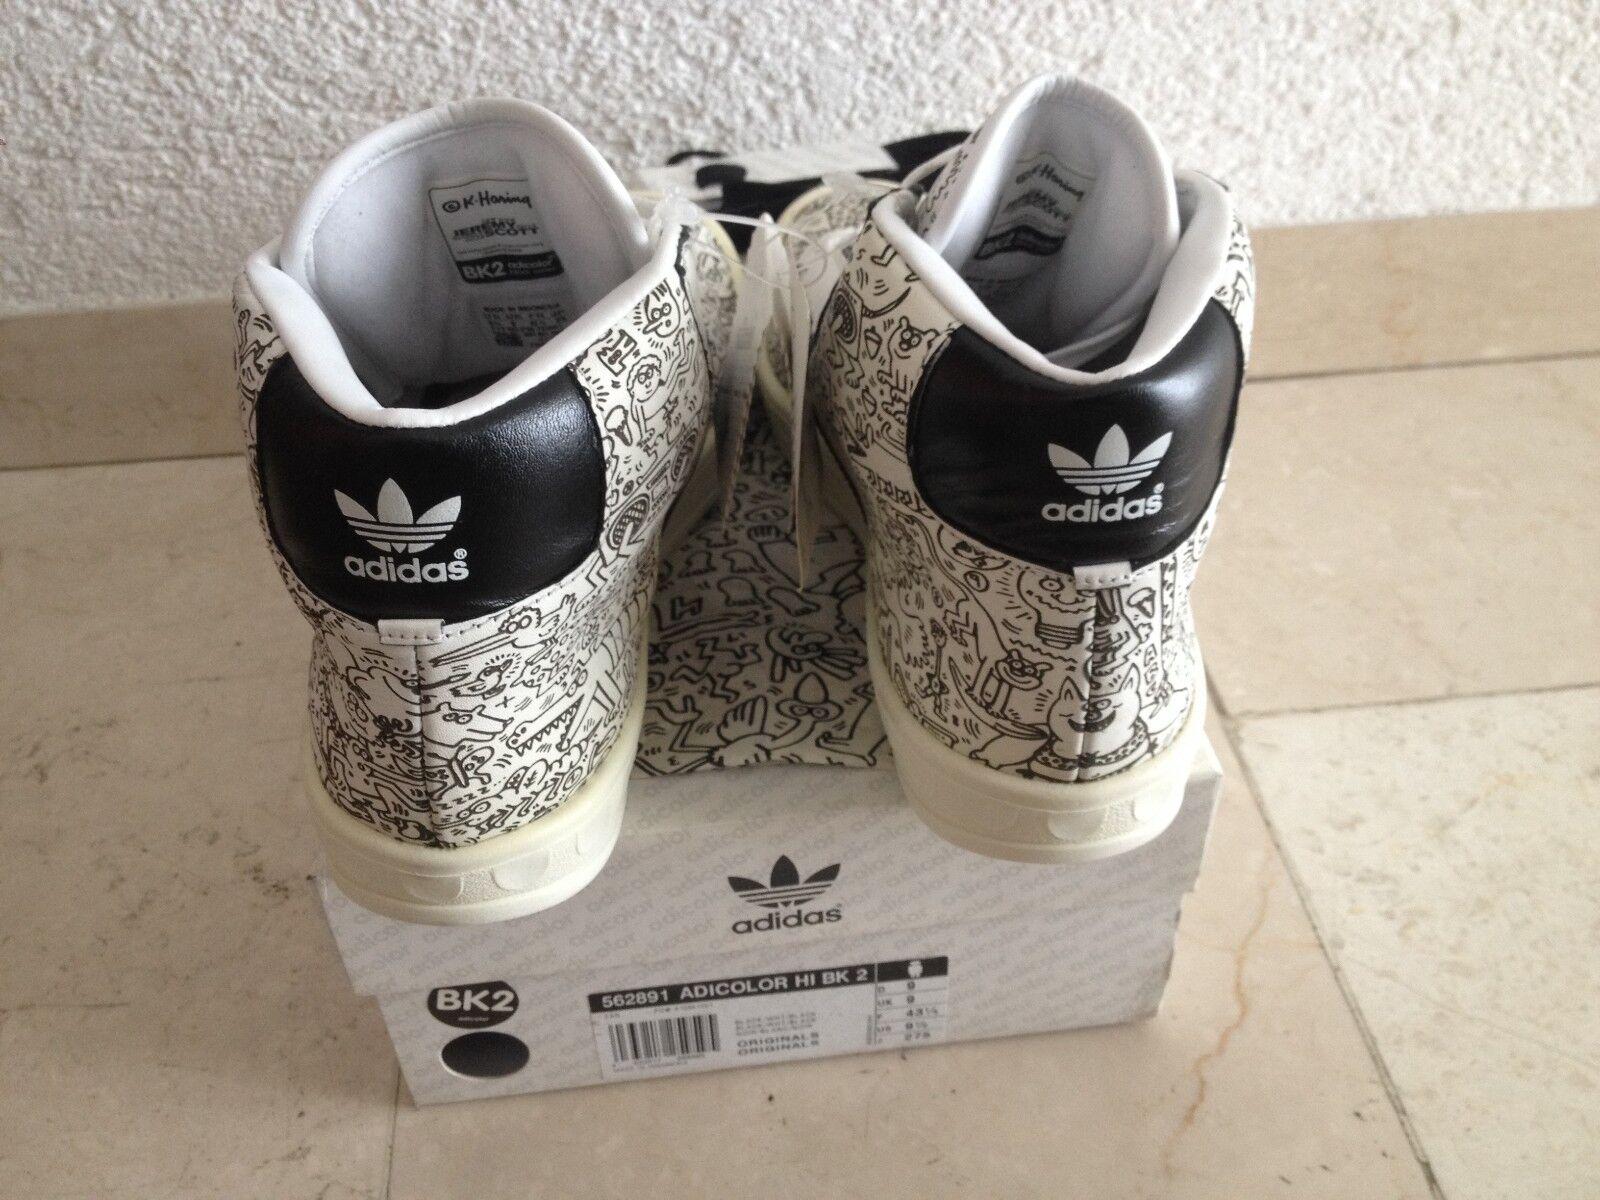 adidas ADICOLOR HI 9.5 BK2  439 US 9.5 HI BNWT 562891 prod. 01/2006 Keith Haring f48548